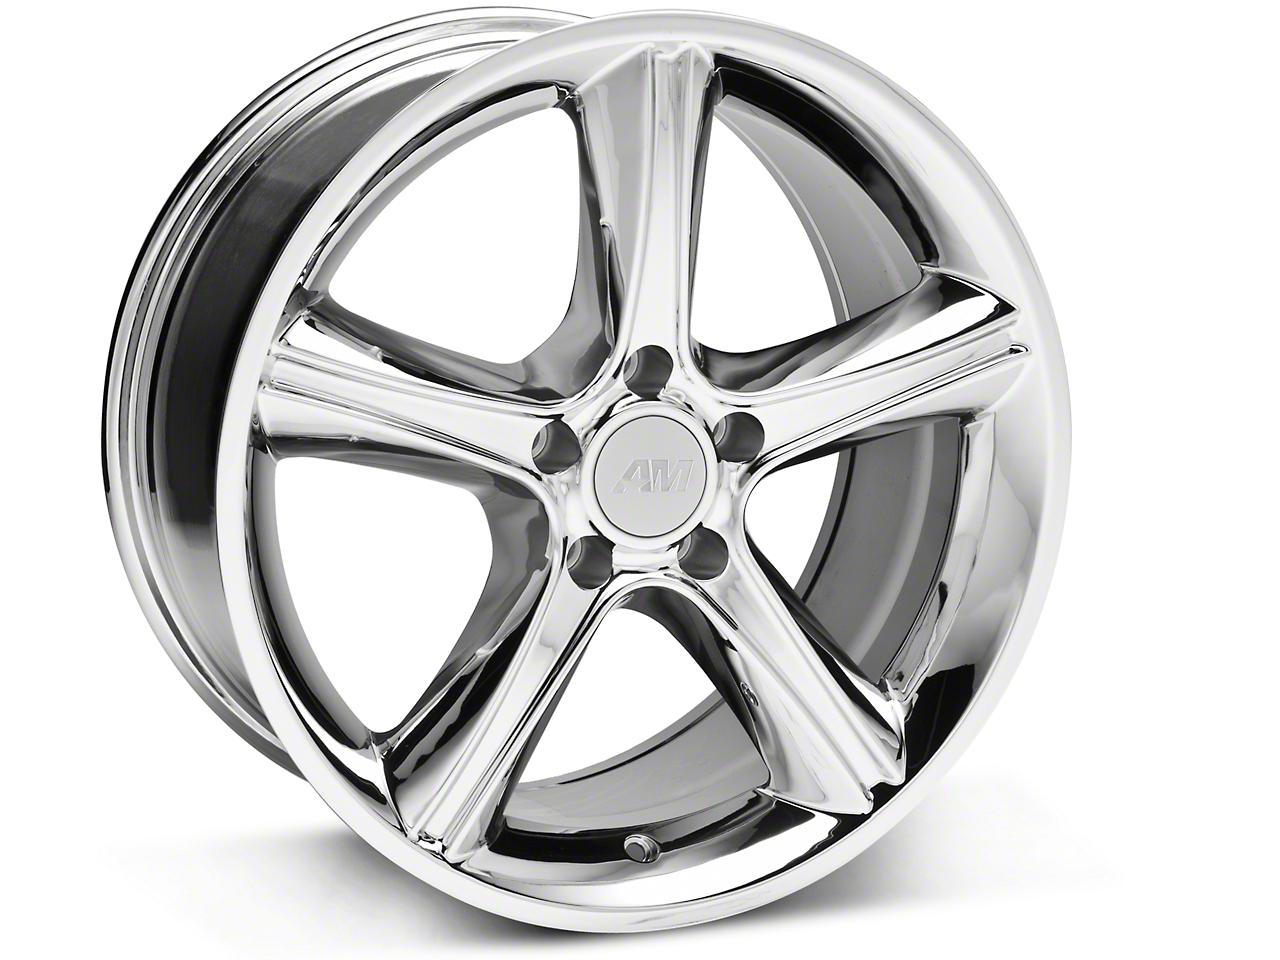 2010 GT Premium Style Chrome Wheel - 18x9 (87-93 w/ 5 Lug Conversion)